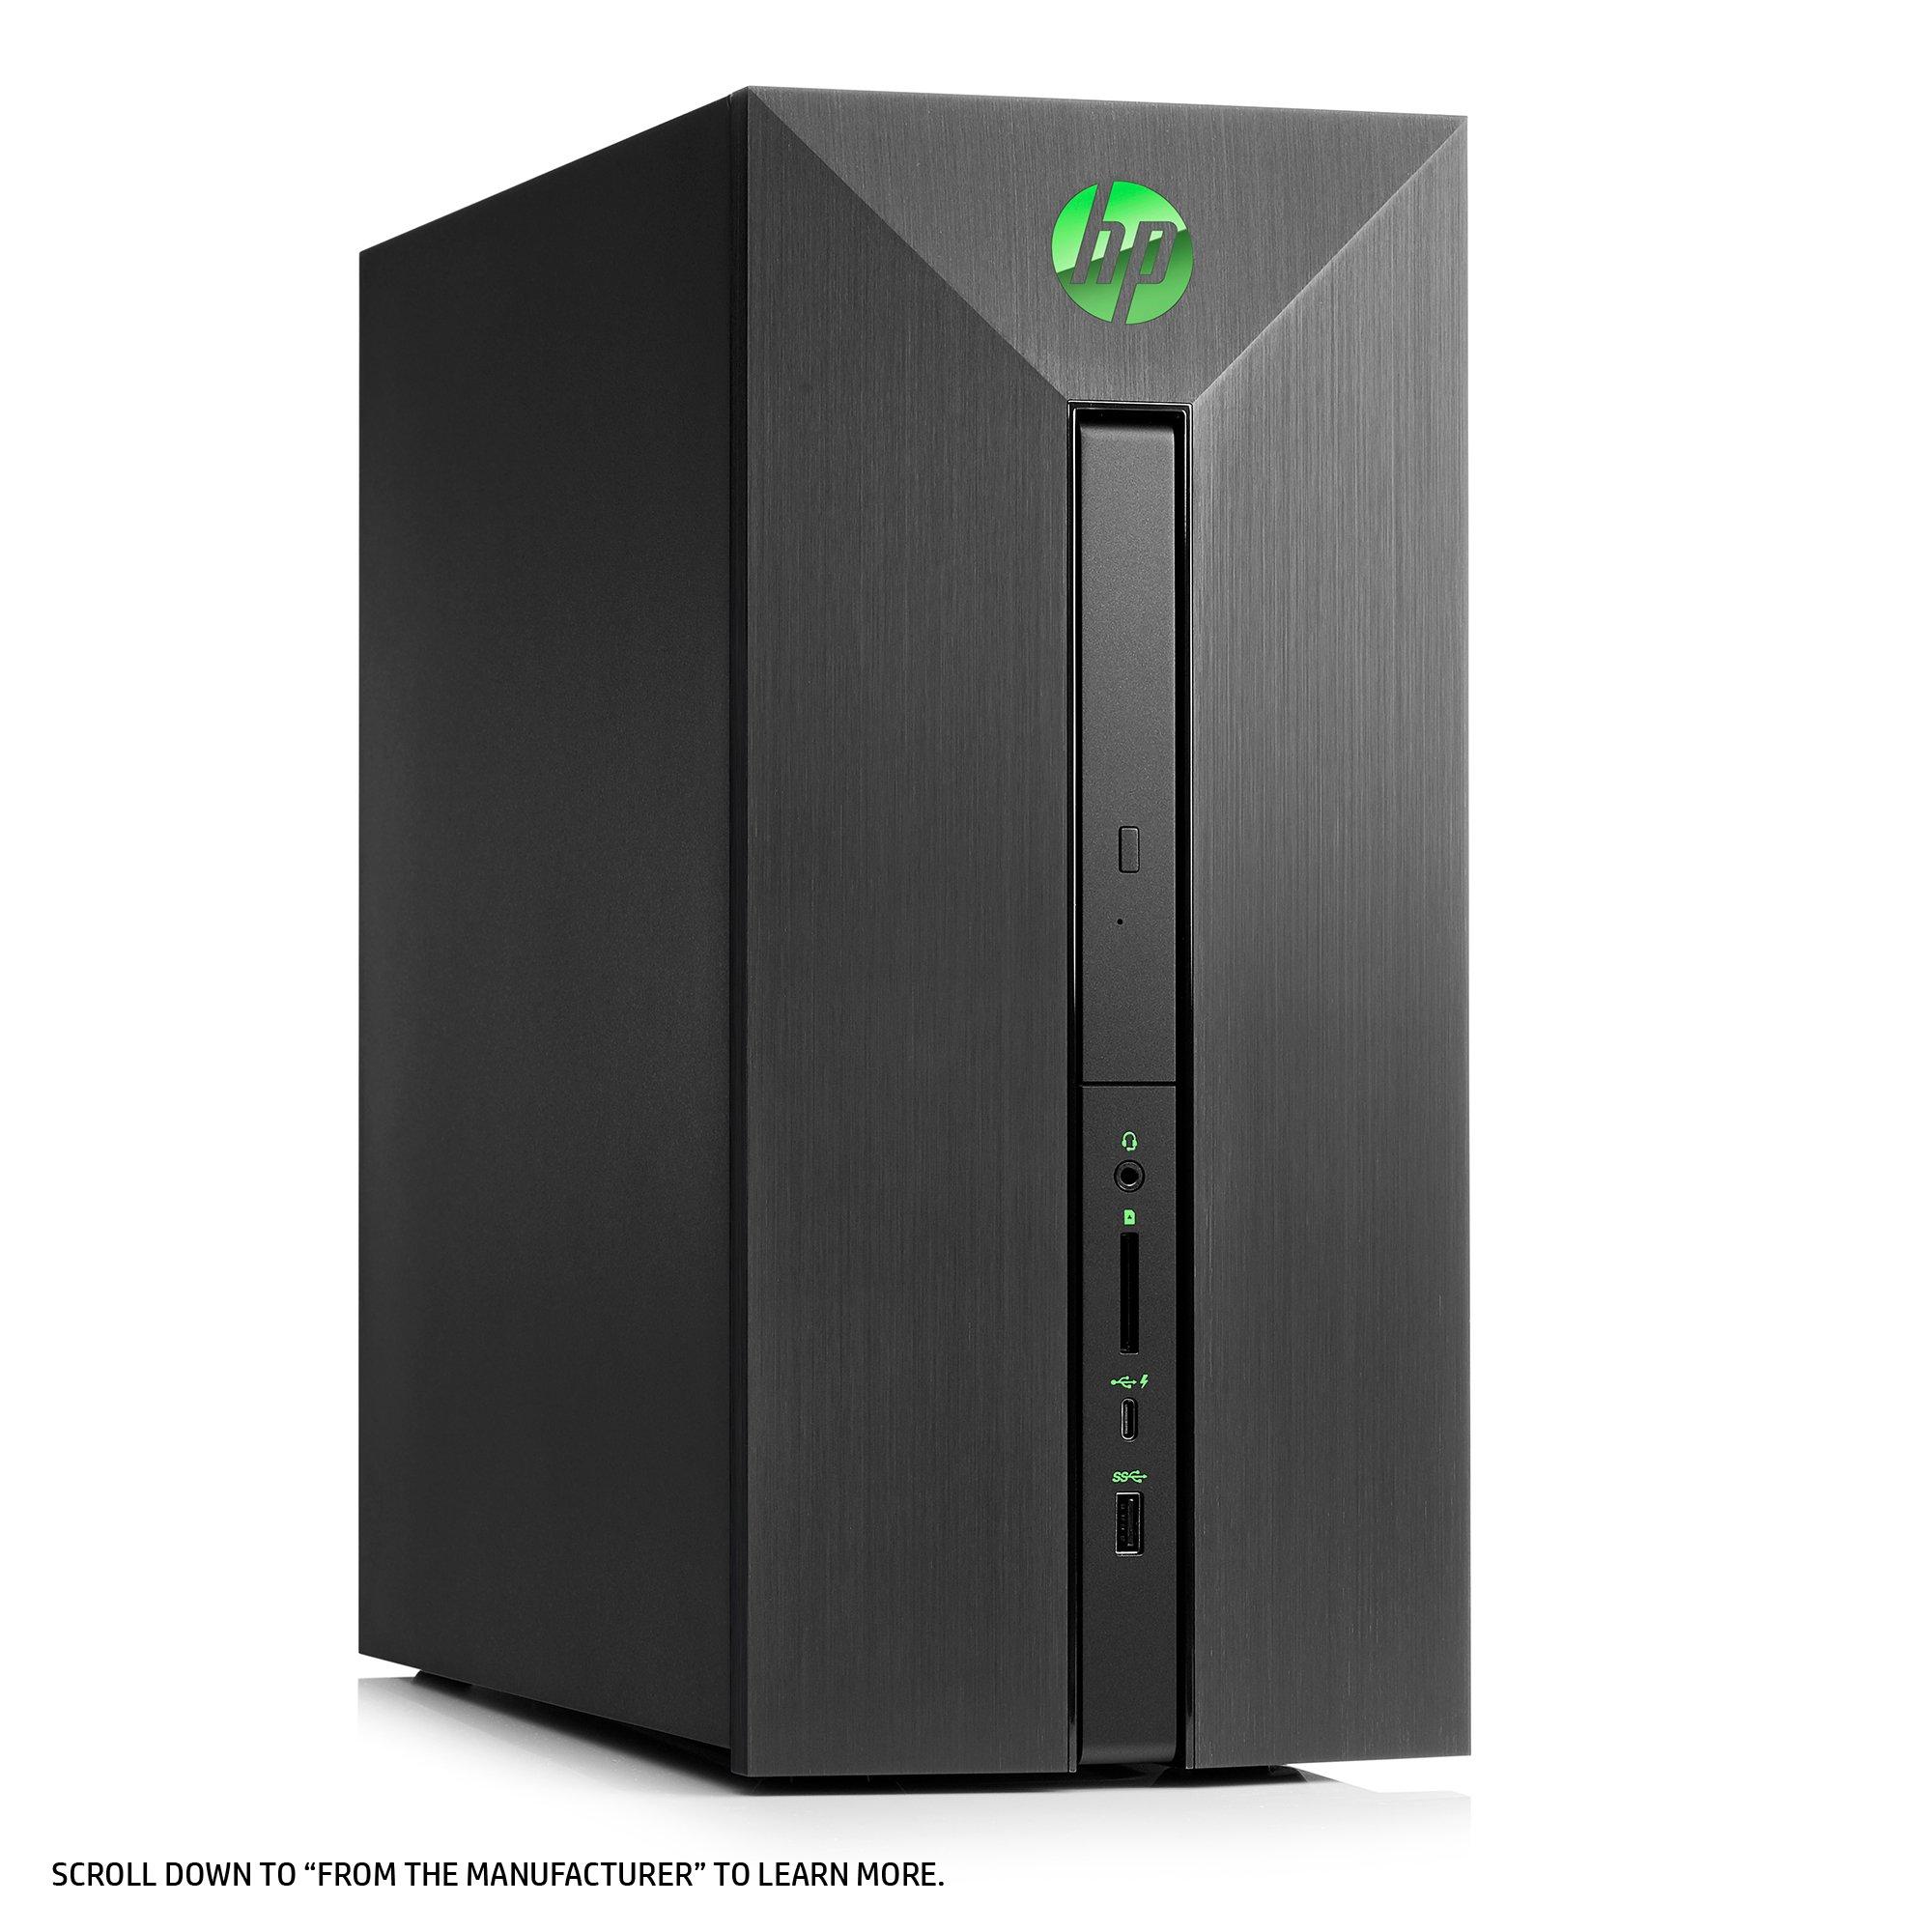 HP Pavilion Power Desktop Computer, Intel Core i7-7700, NVIDIA GeForce GTX 1060, 16GB RAM, 1TB hard drive, 128GB SSD, Windows 10 (580-068, Black) by HP (Image #4)